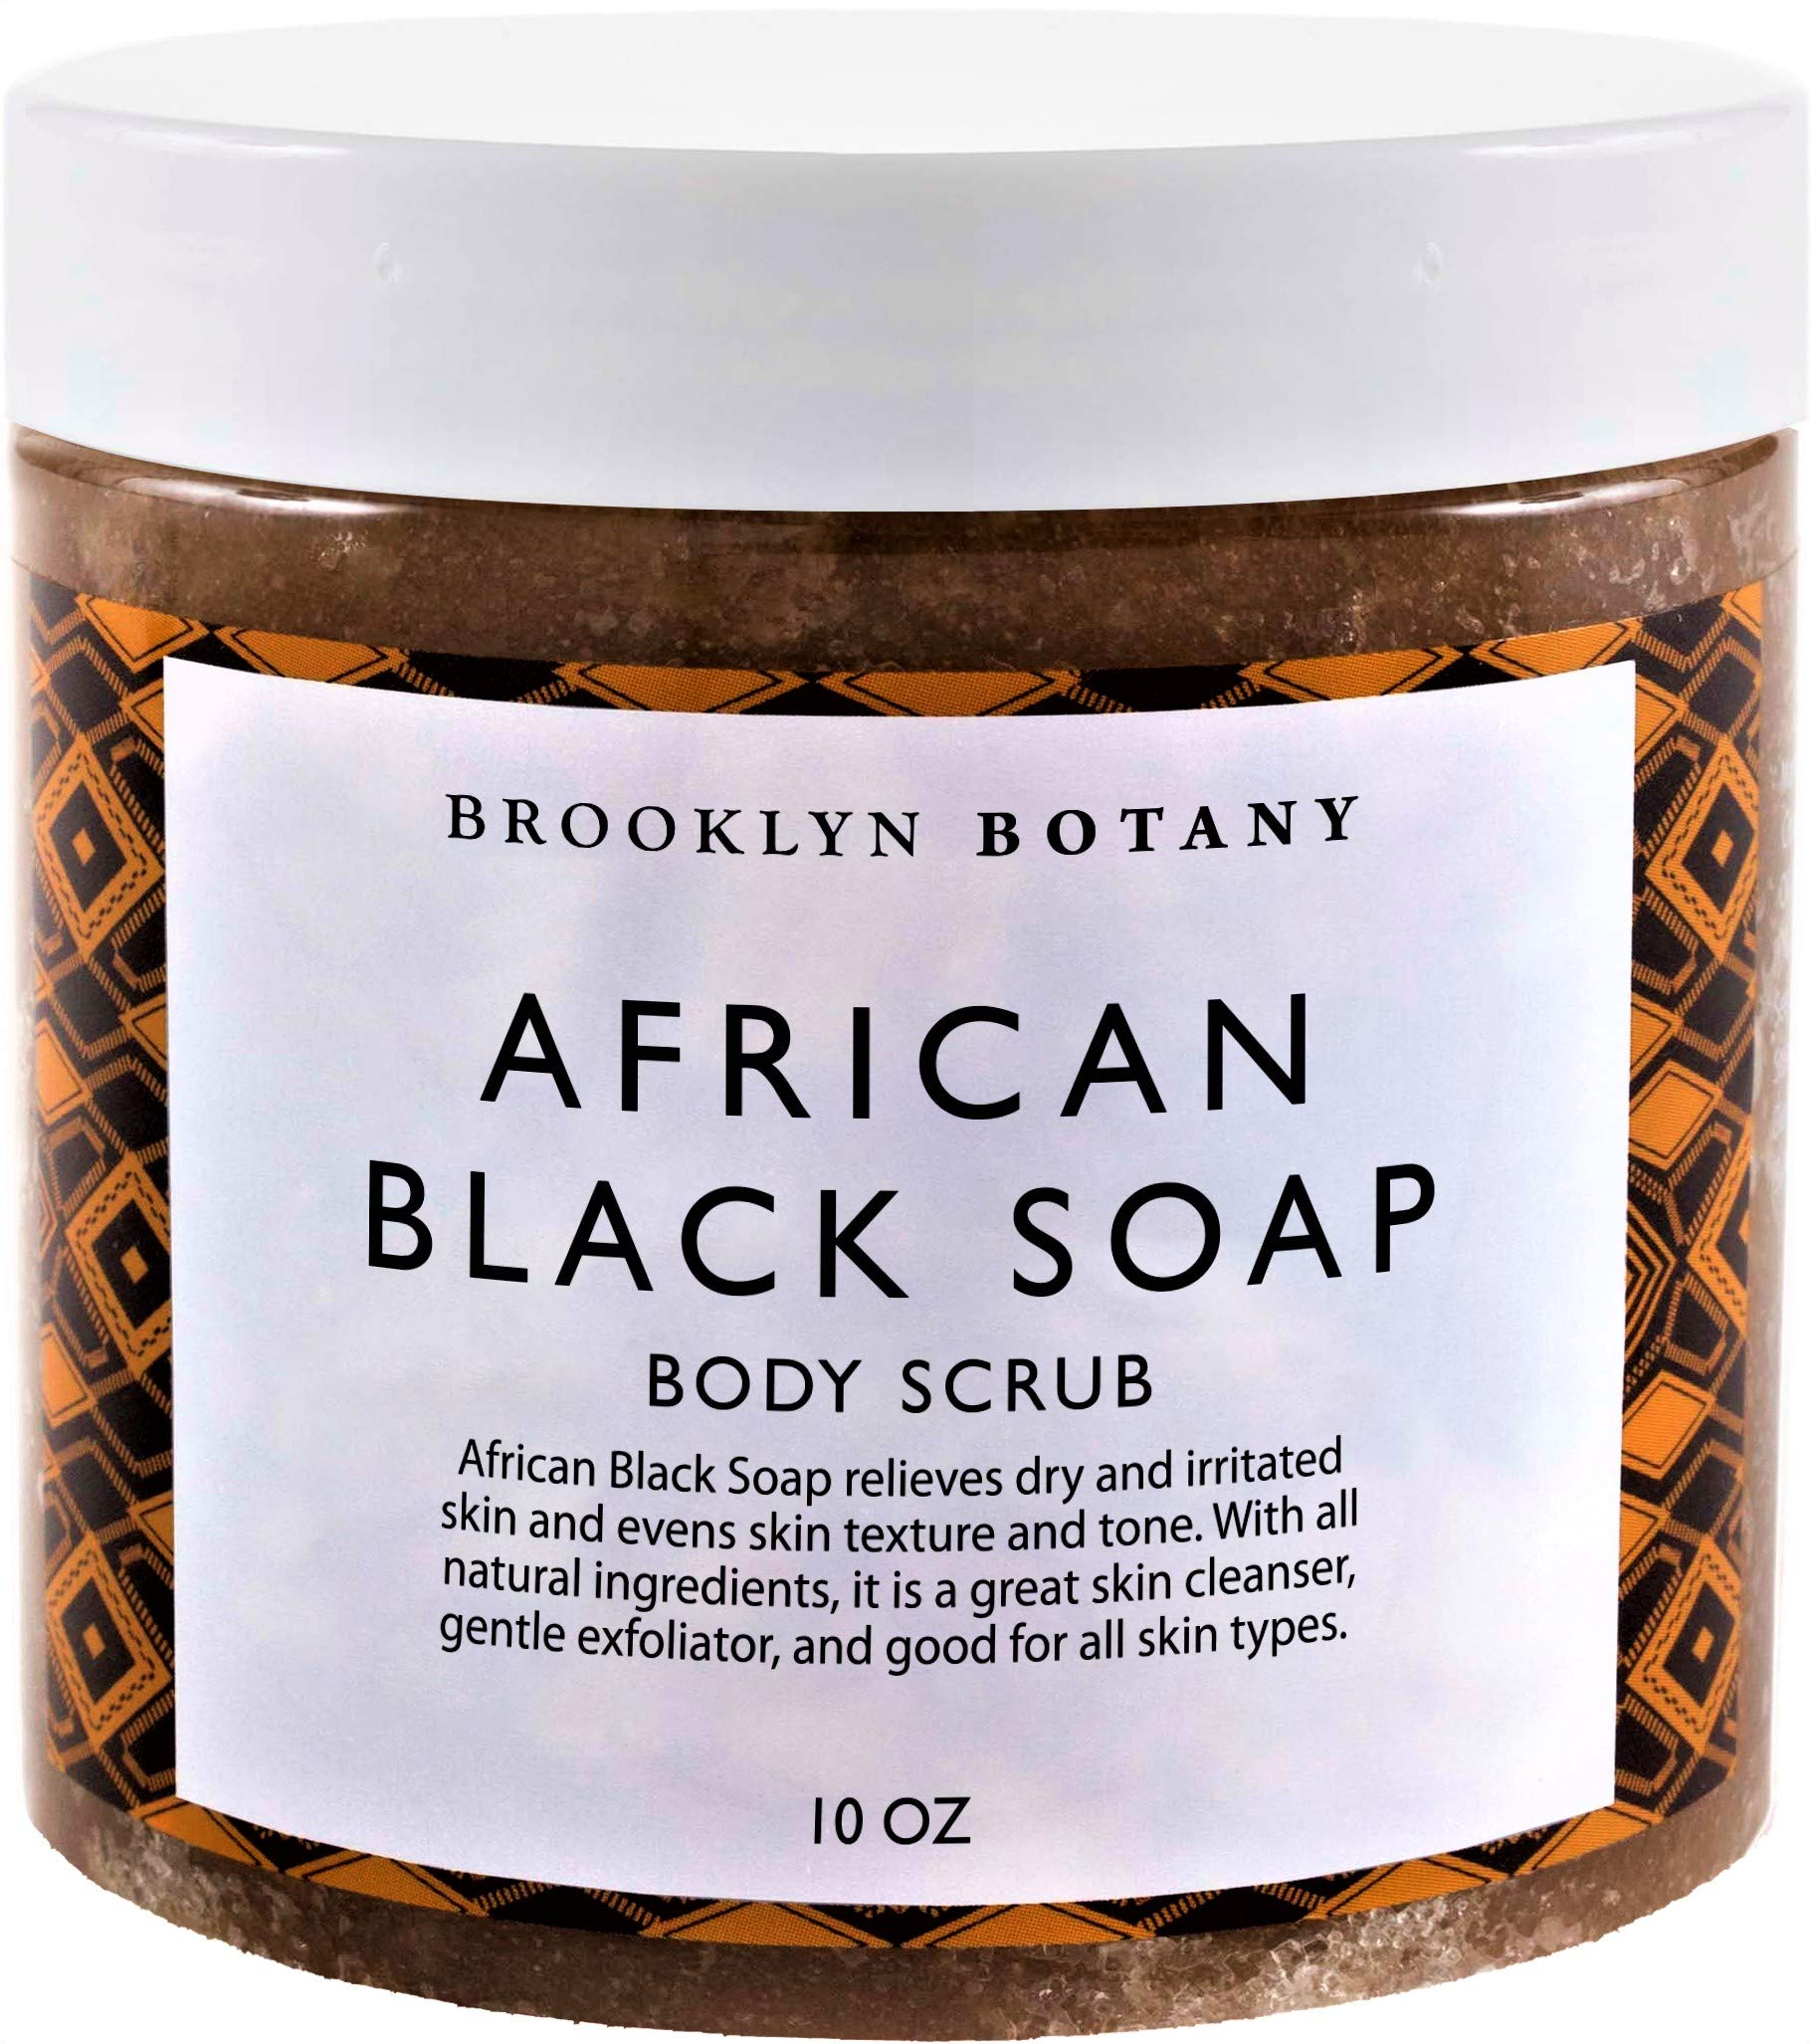 Brooklyn Botany African Black Soap Body Scrub Face Scrub 10 oz - Shea Butter & Coconut Oil - Eczema Soap Acne Treatment - Exfoliate & Moisturize, Facial Scrub, Back Acne, Relieve Dry & Irritated Skin by Brooklyn Botany